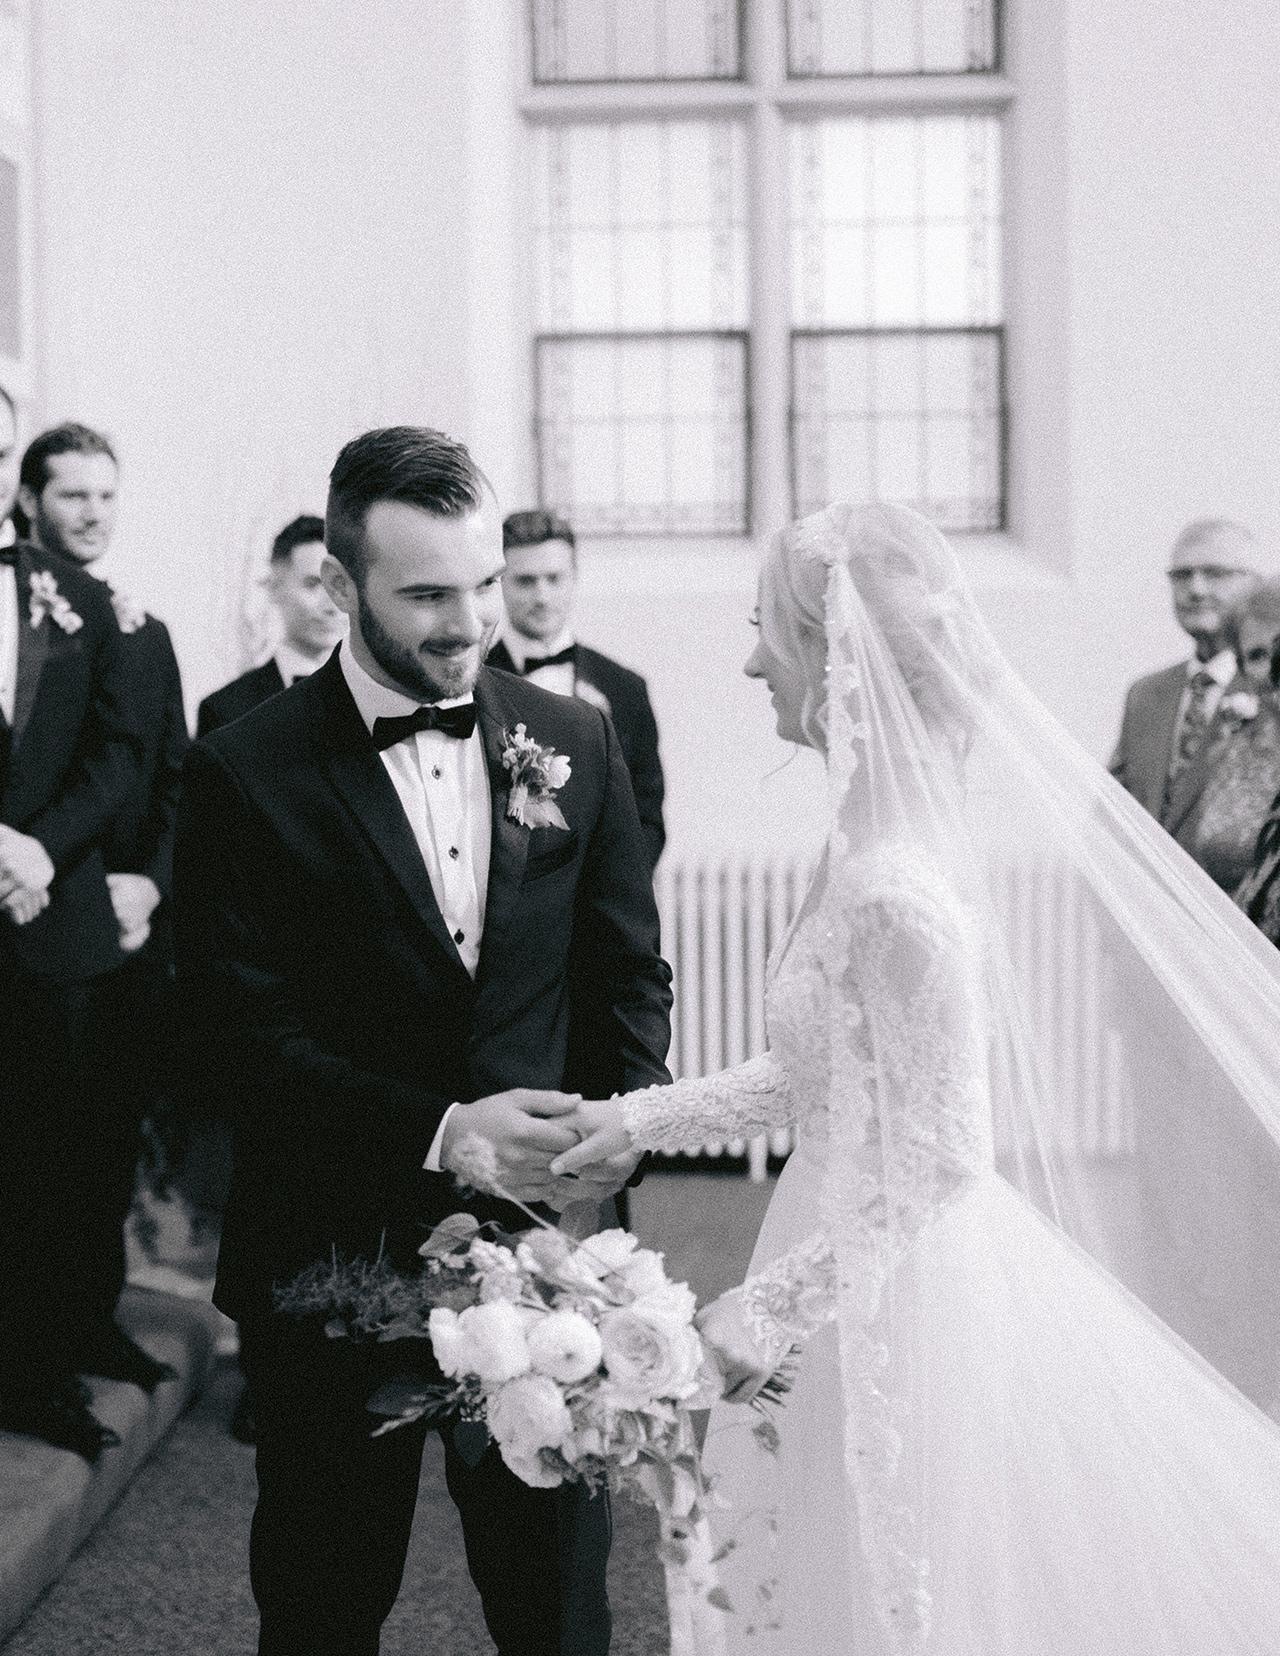 bride groom wedding processional indoors